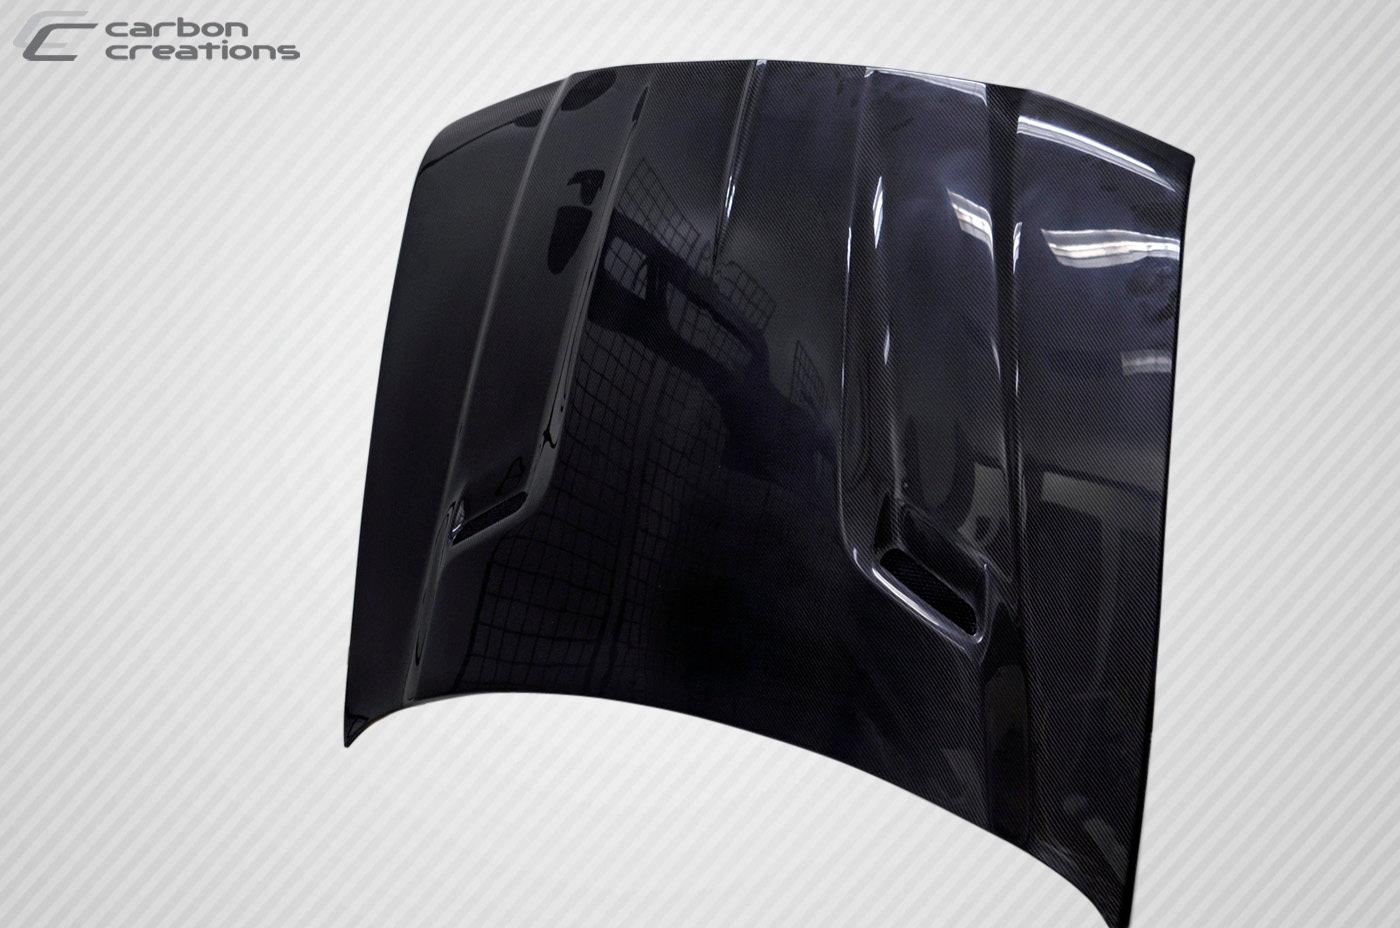 New Carbon Creations Hood 05 10 Chrysler 300 300c